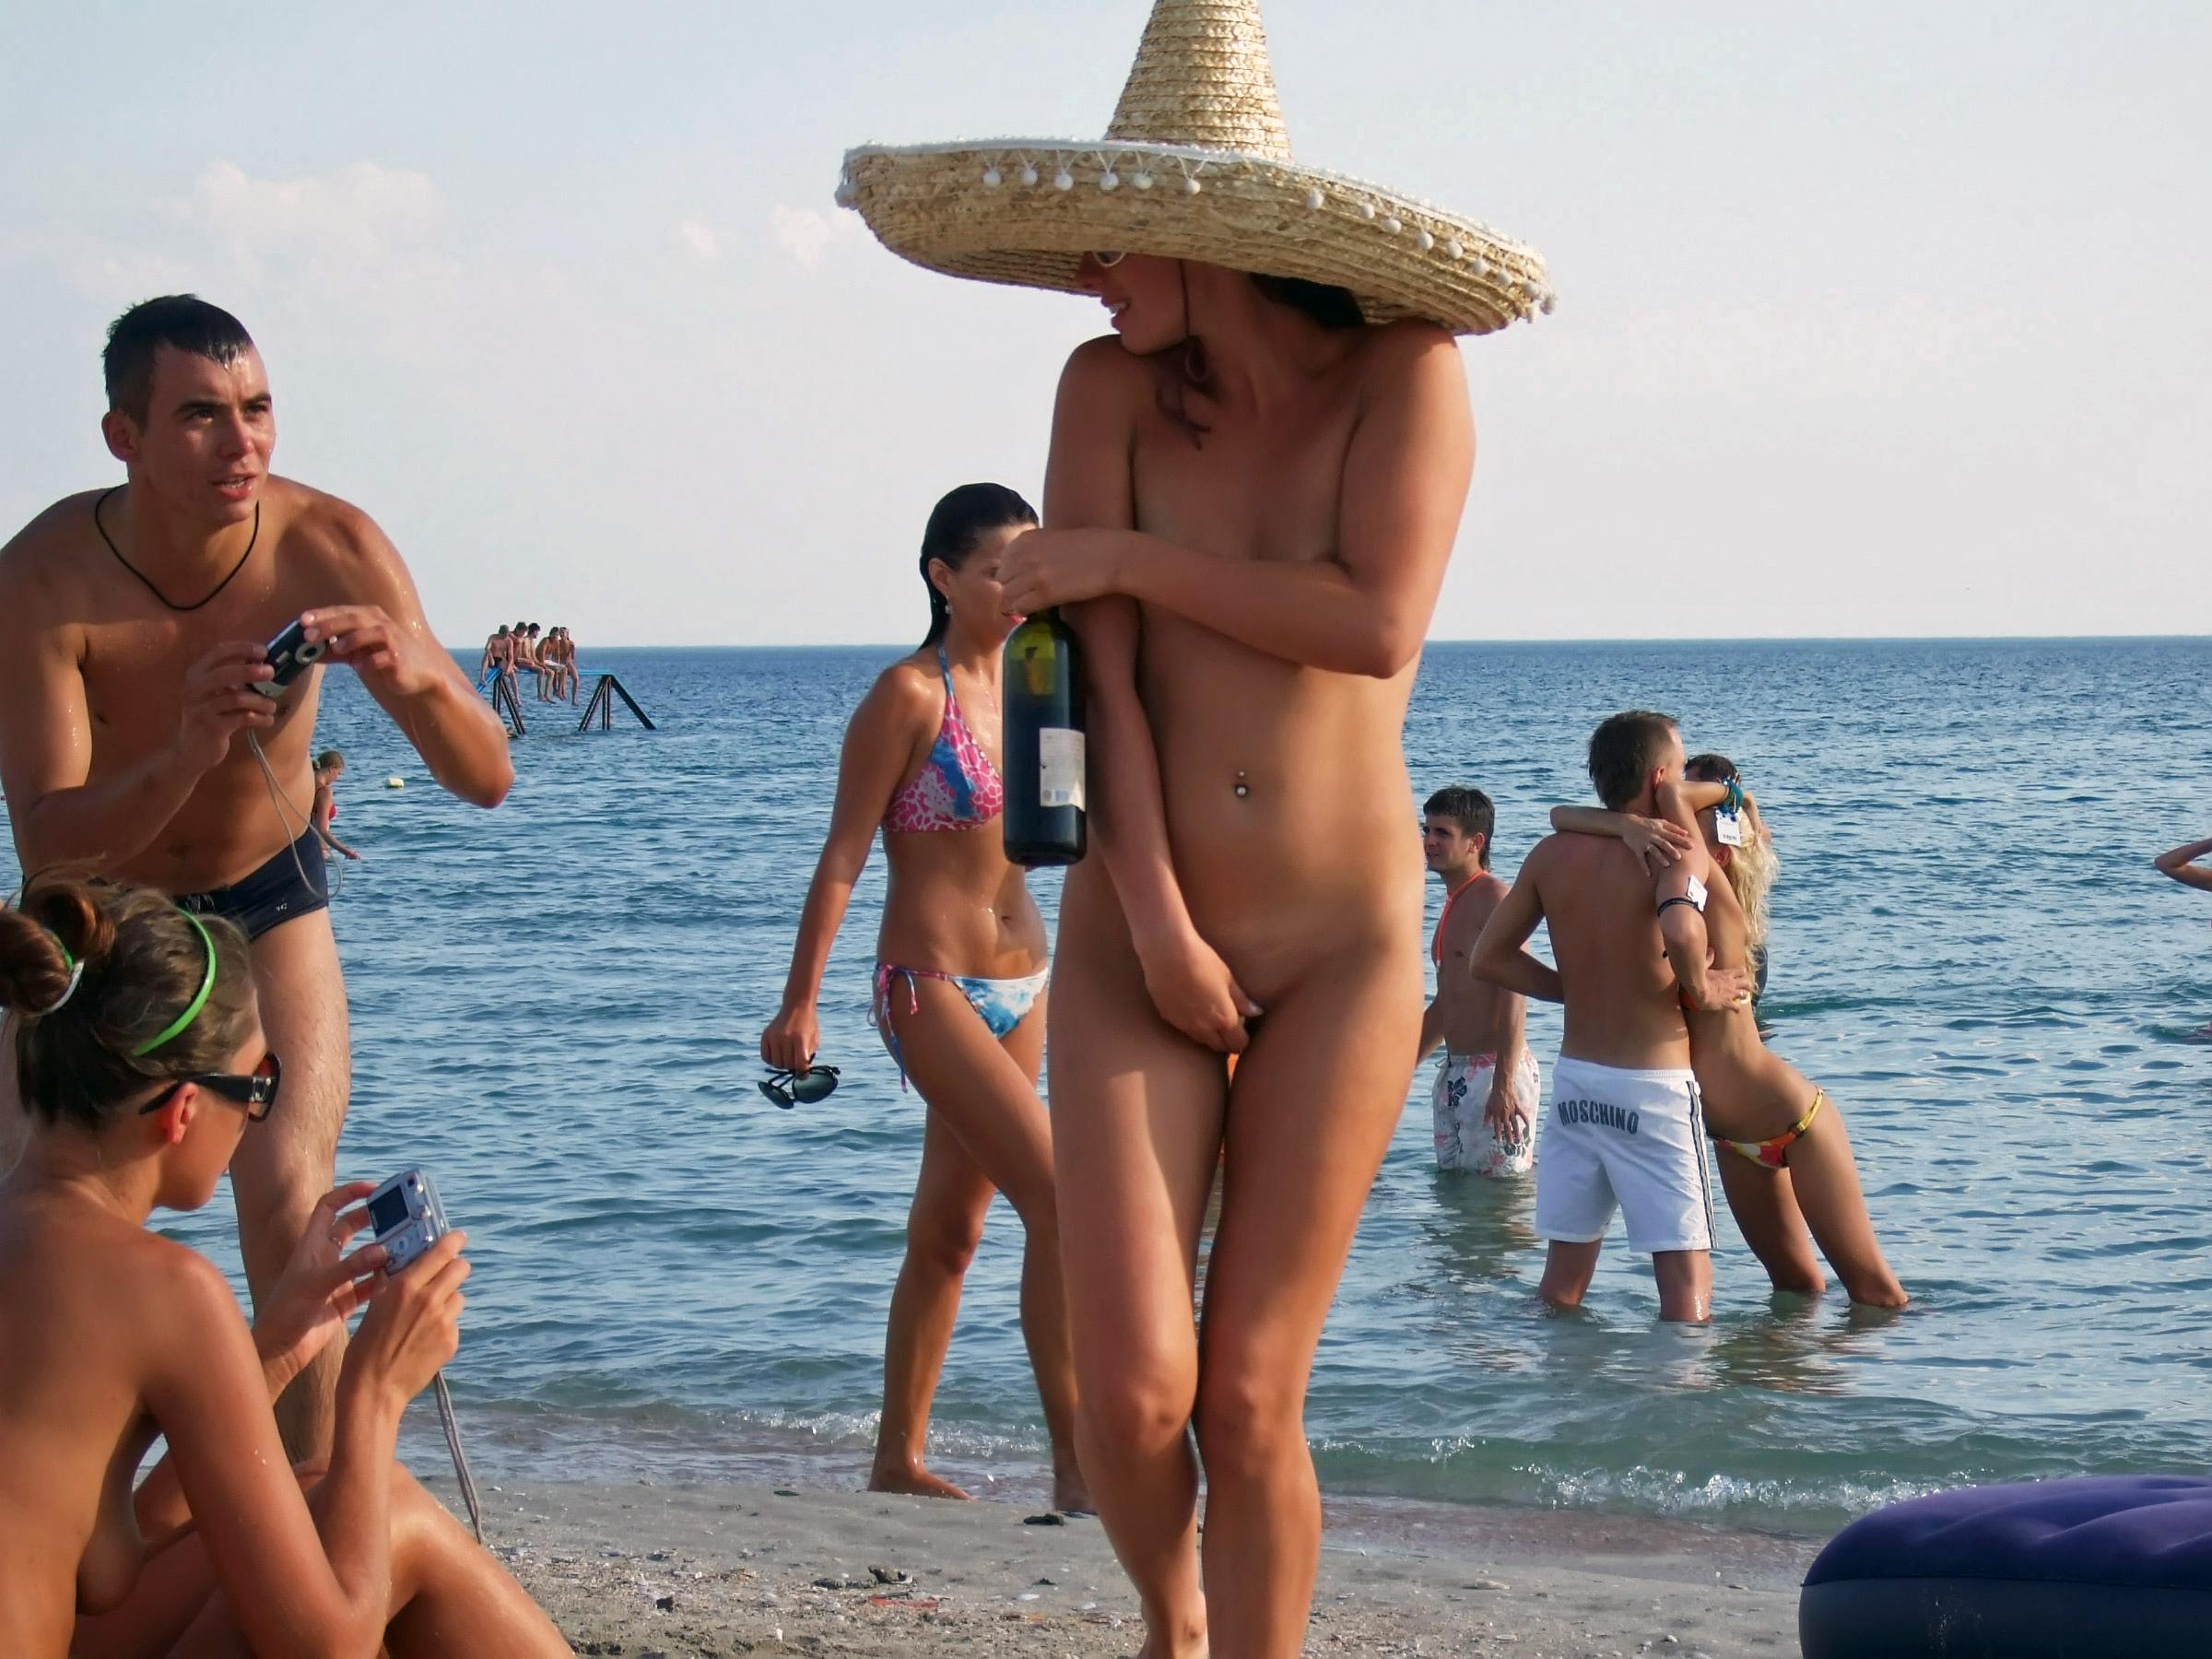 nude-beach-nudists-girls-mix-vol6-98